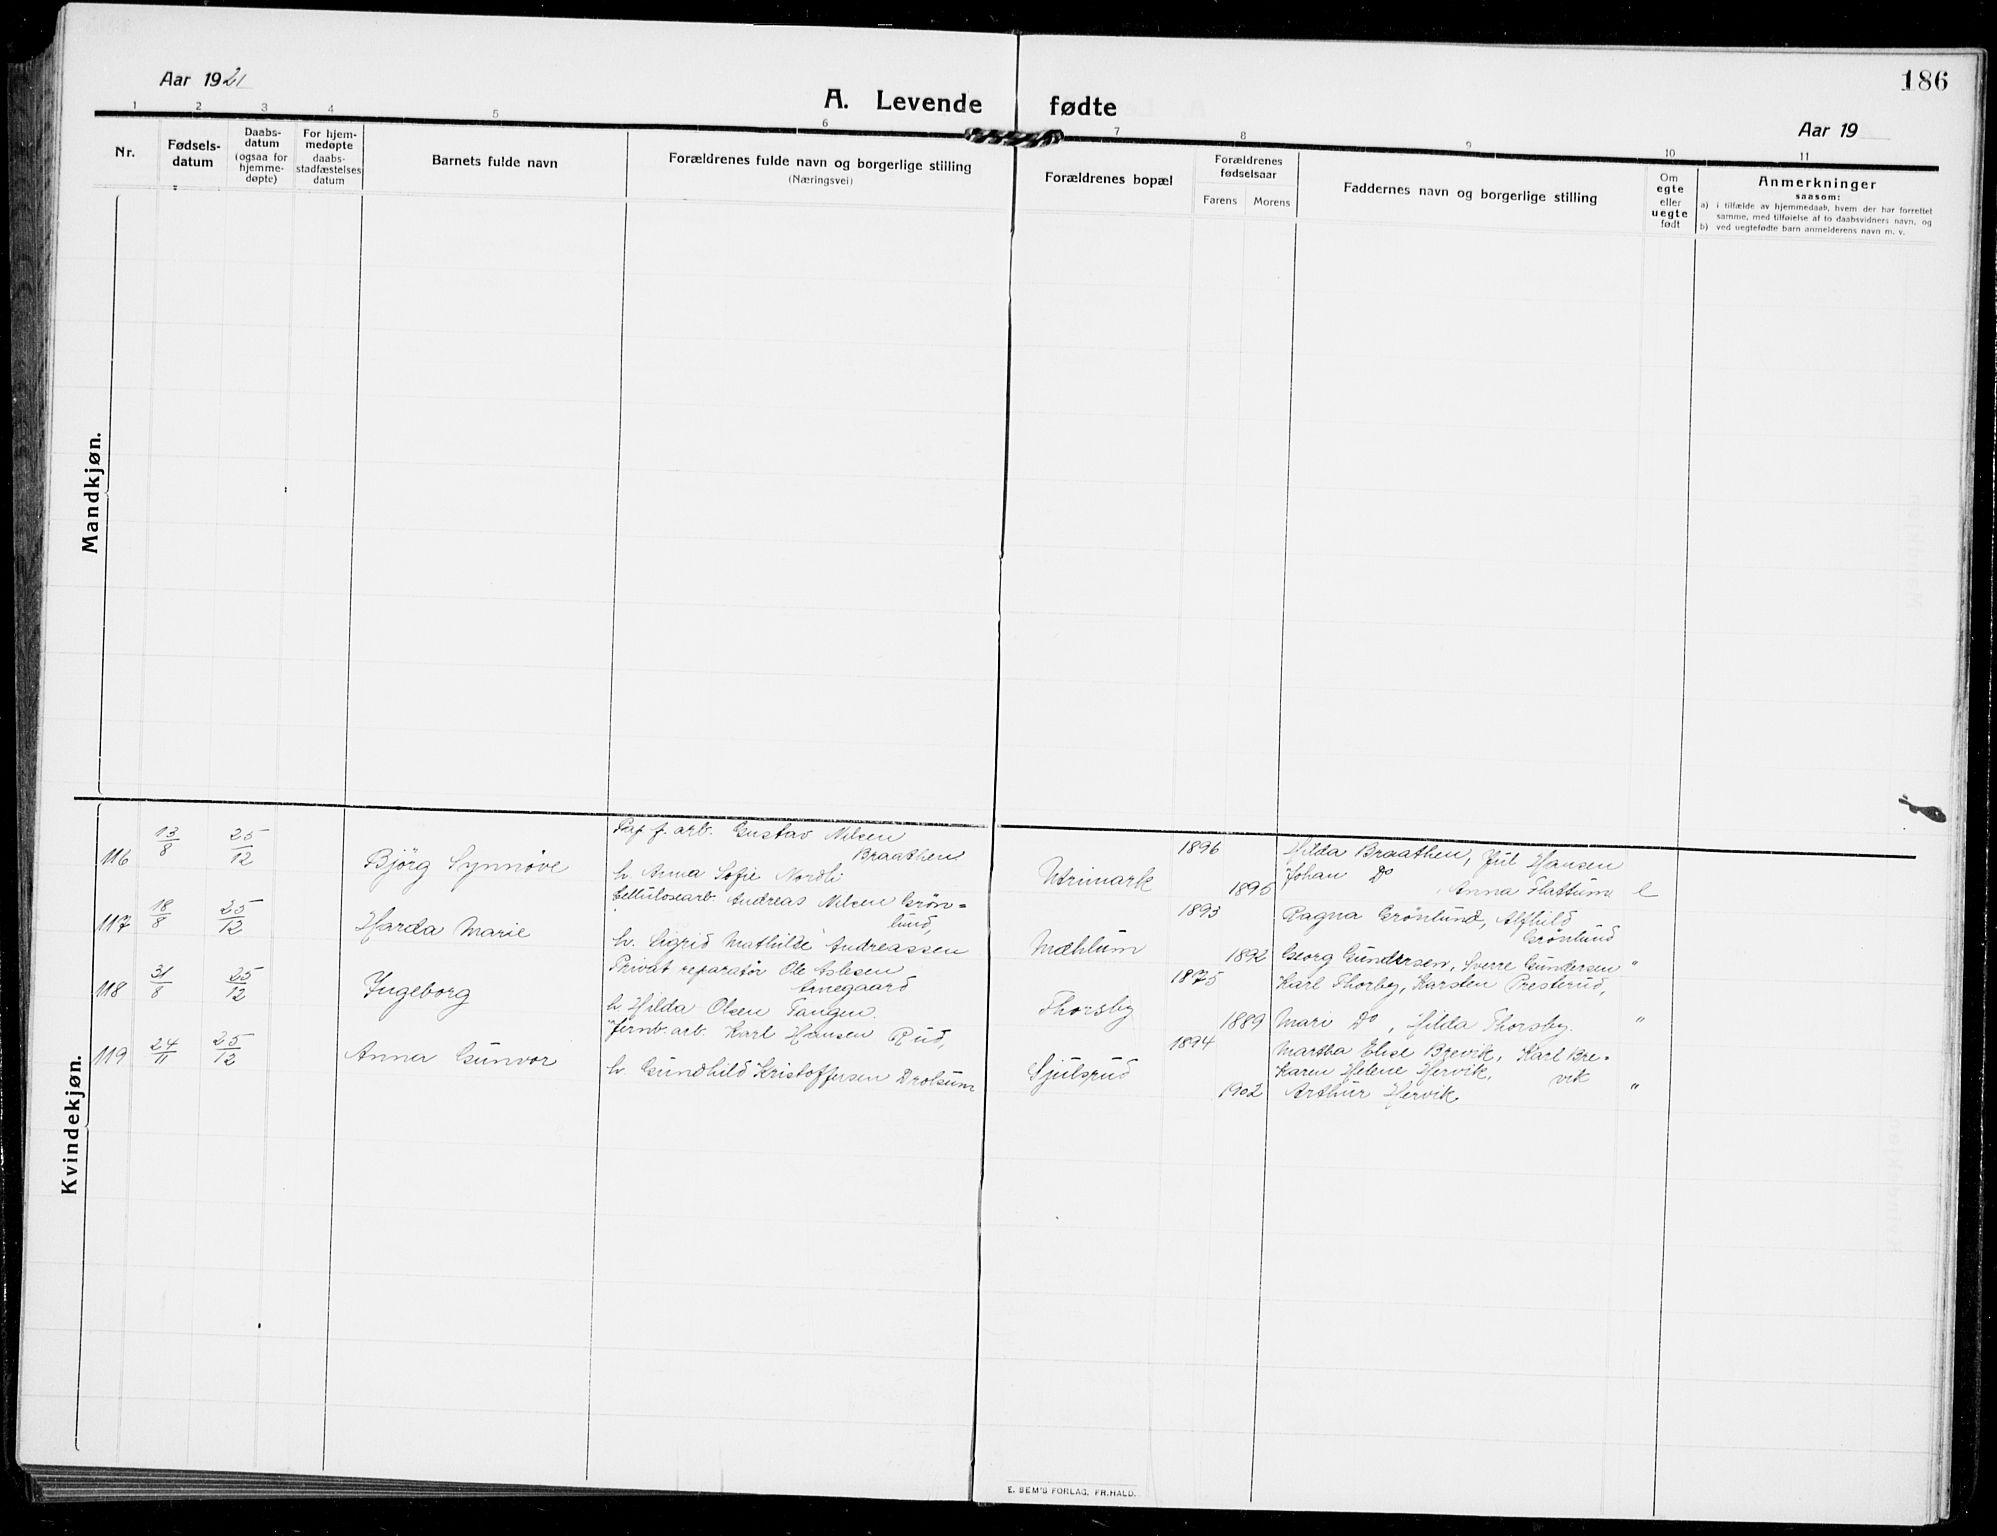 SAKO, Modum kirkebøker, G/Ga/L0009: Parish register (copy) no. I 9, 1909-1923, p. 186